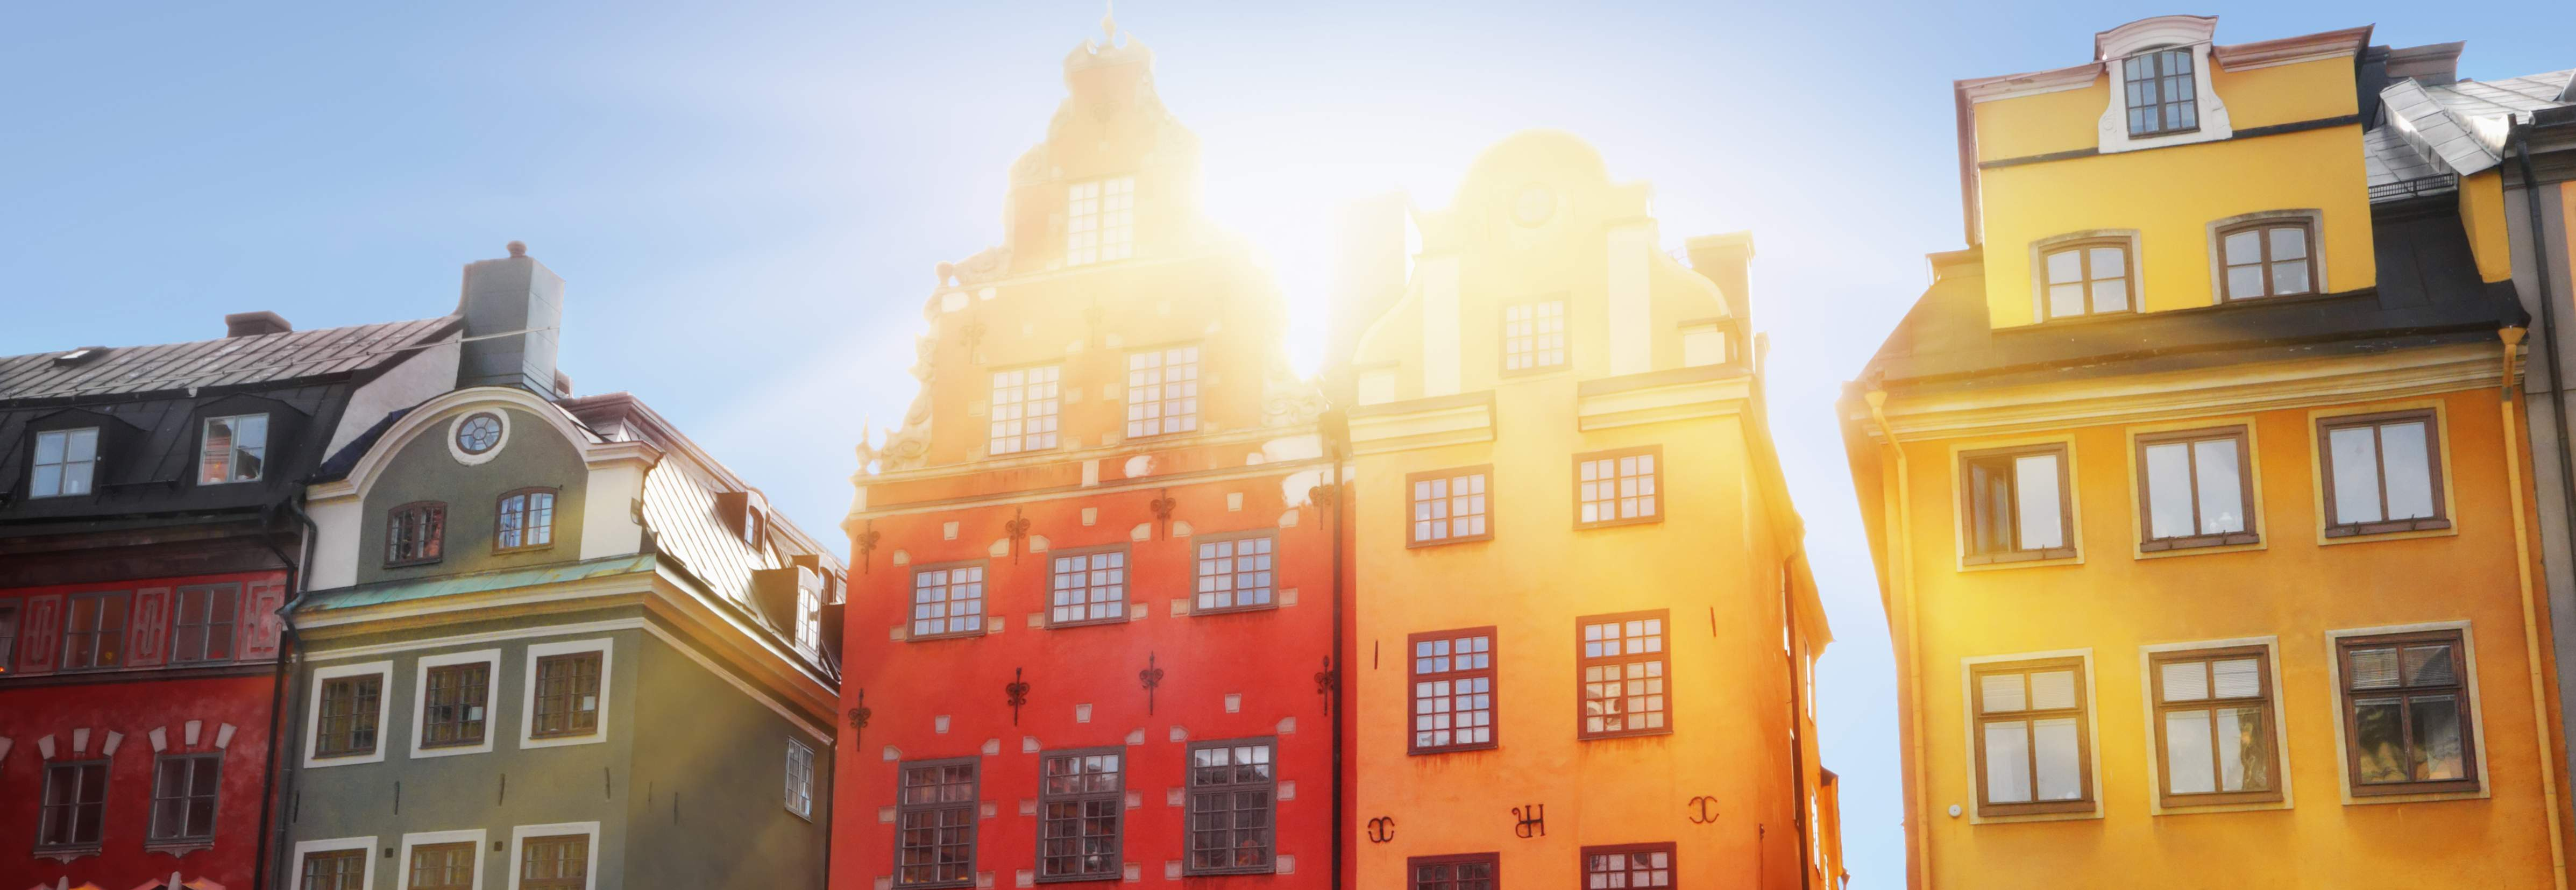 hotel gamla stan stockholm